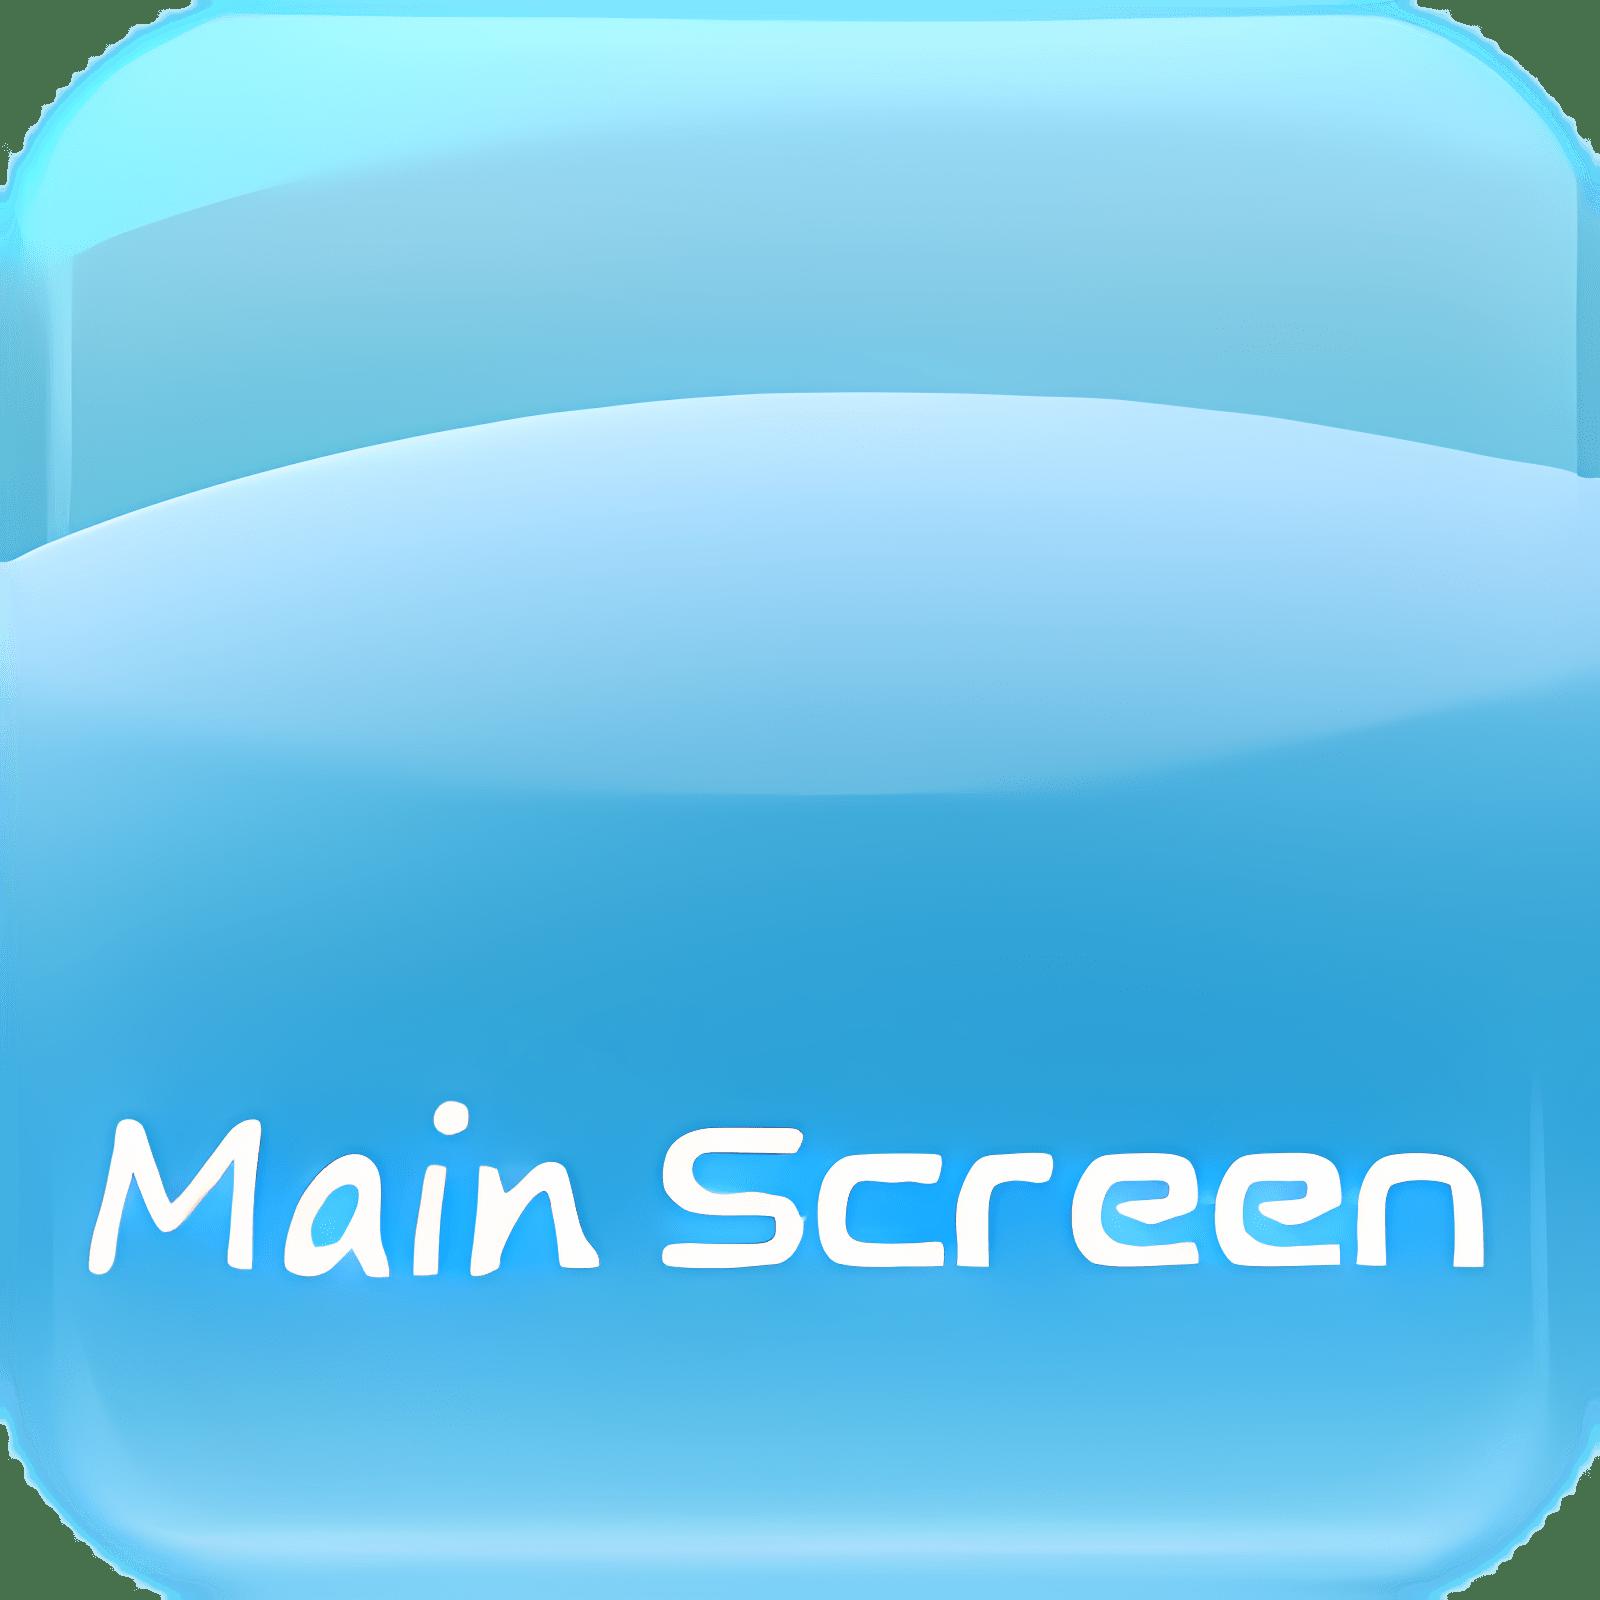 Main Screen 2.1.2 Beta